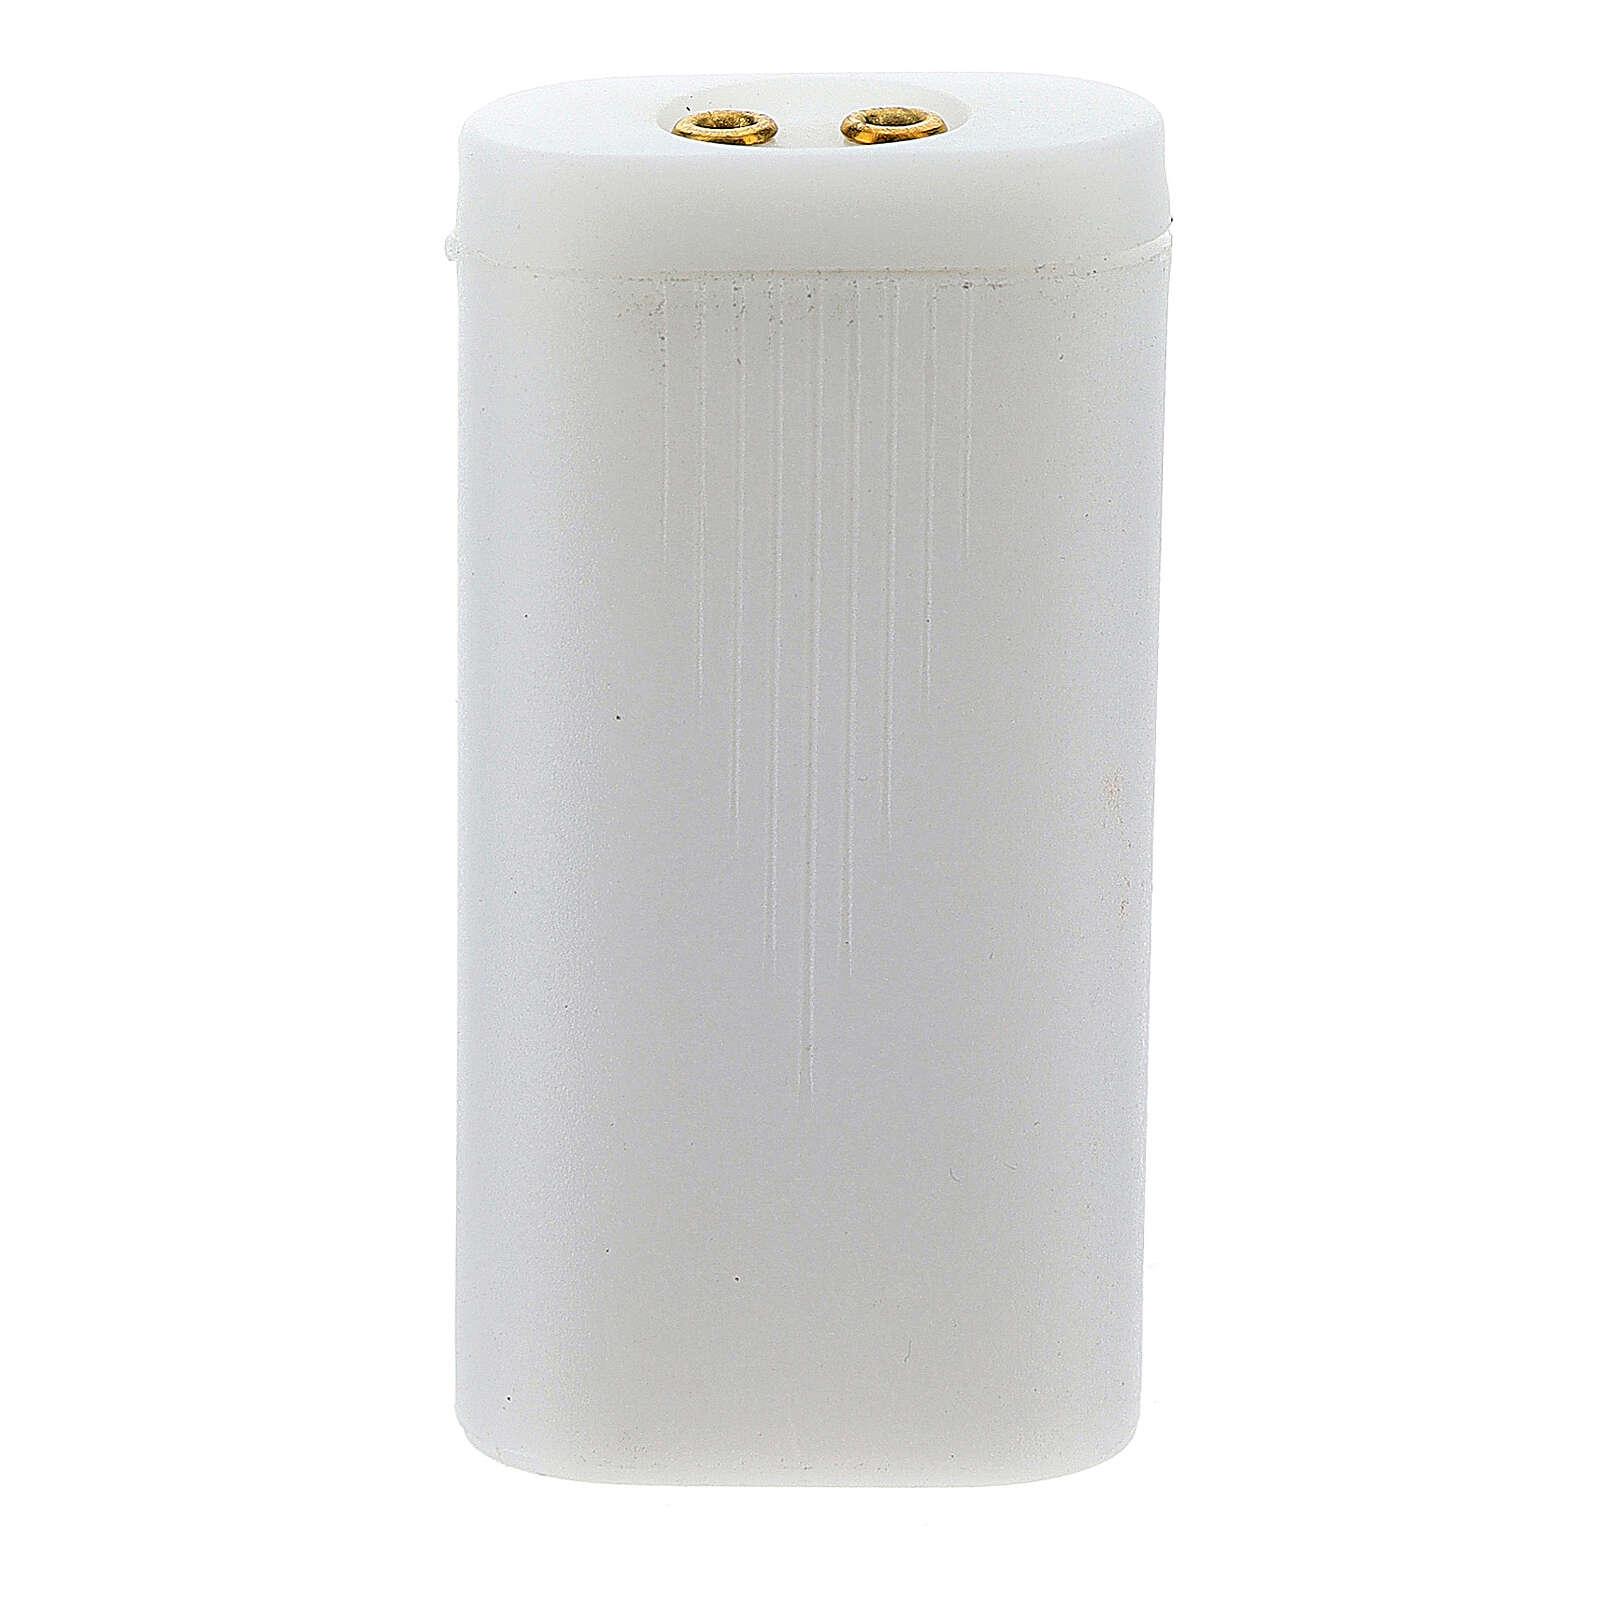 Porta baterías AA para luces belén 4